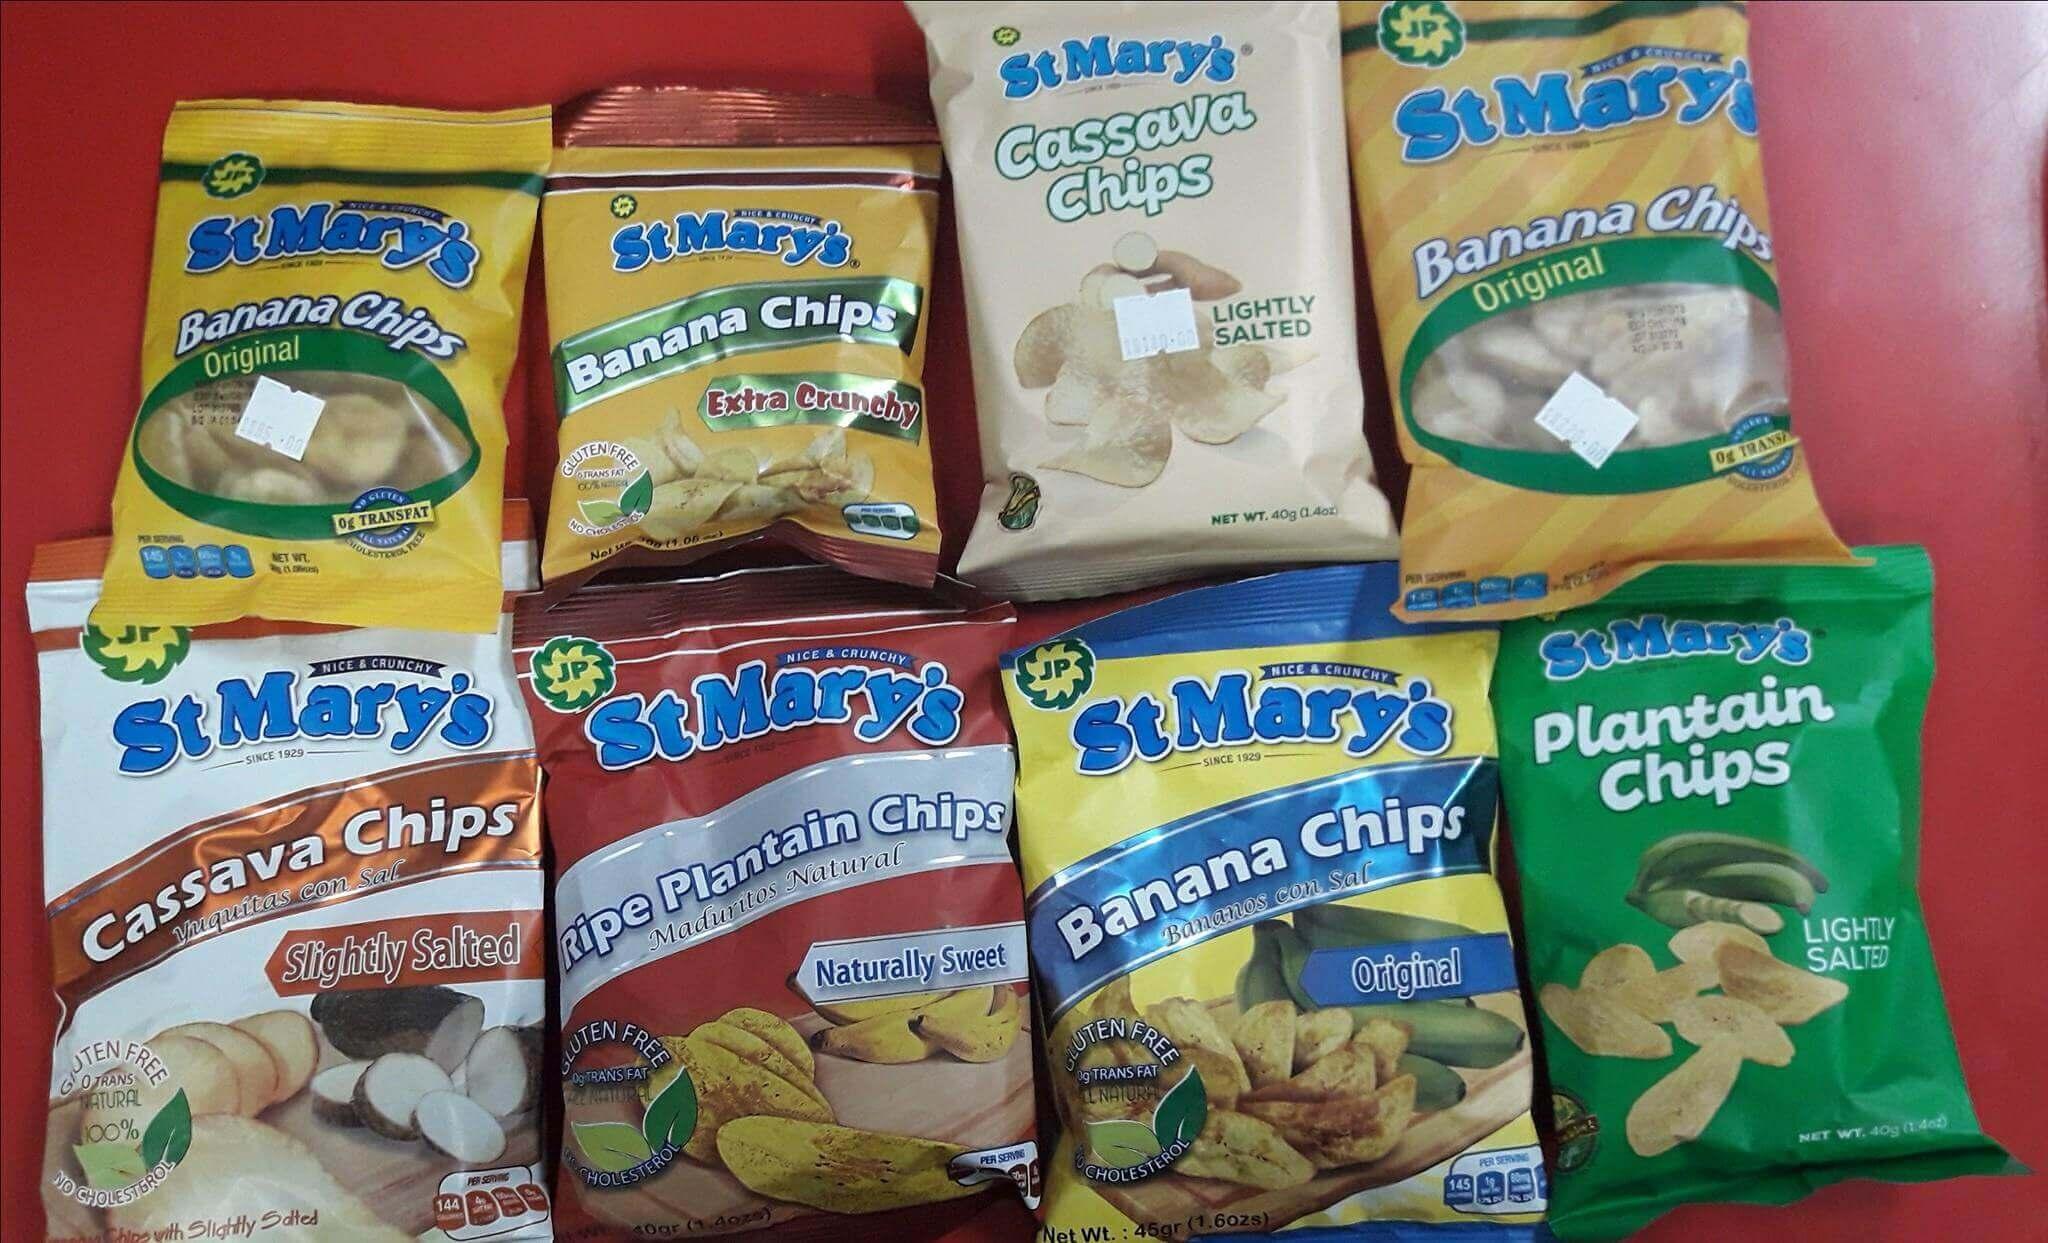 jamaican_banana_chips_st_mary